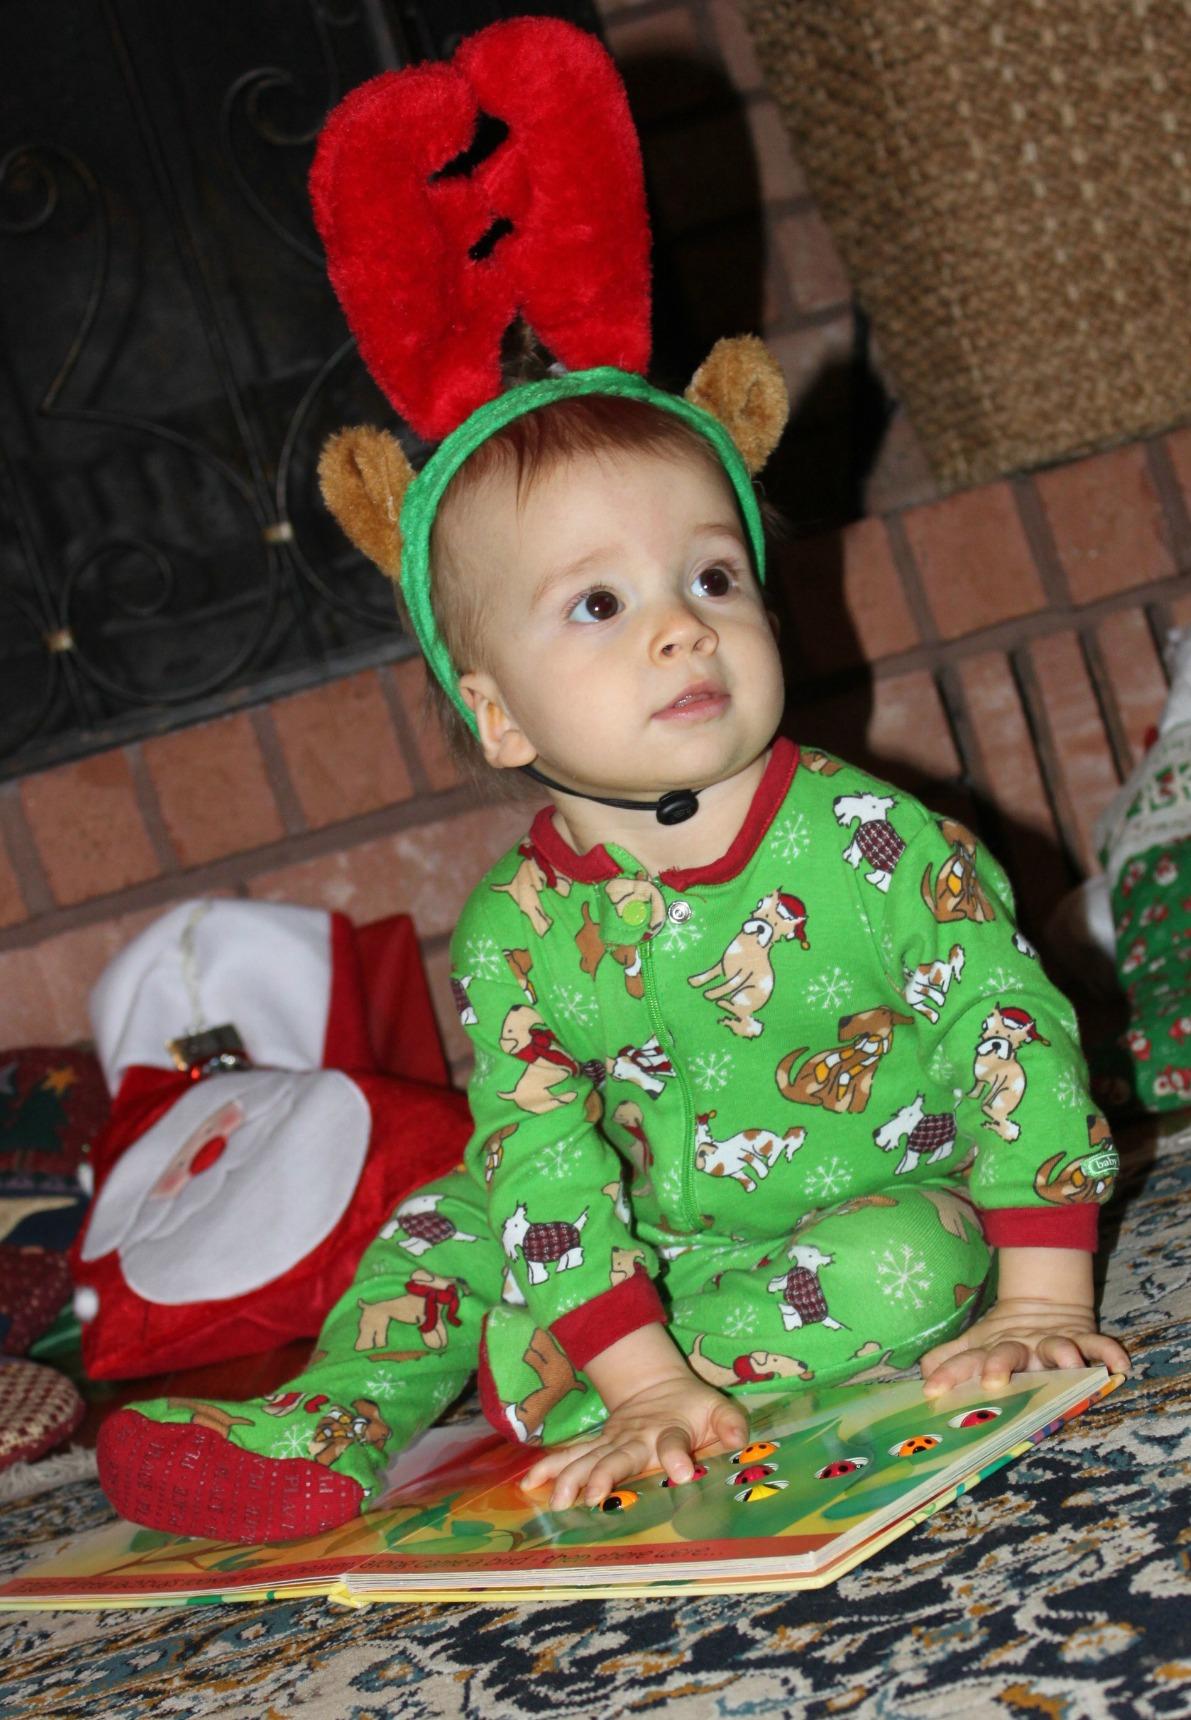 Tyson - Reindeer